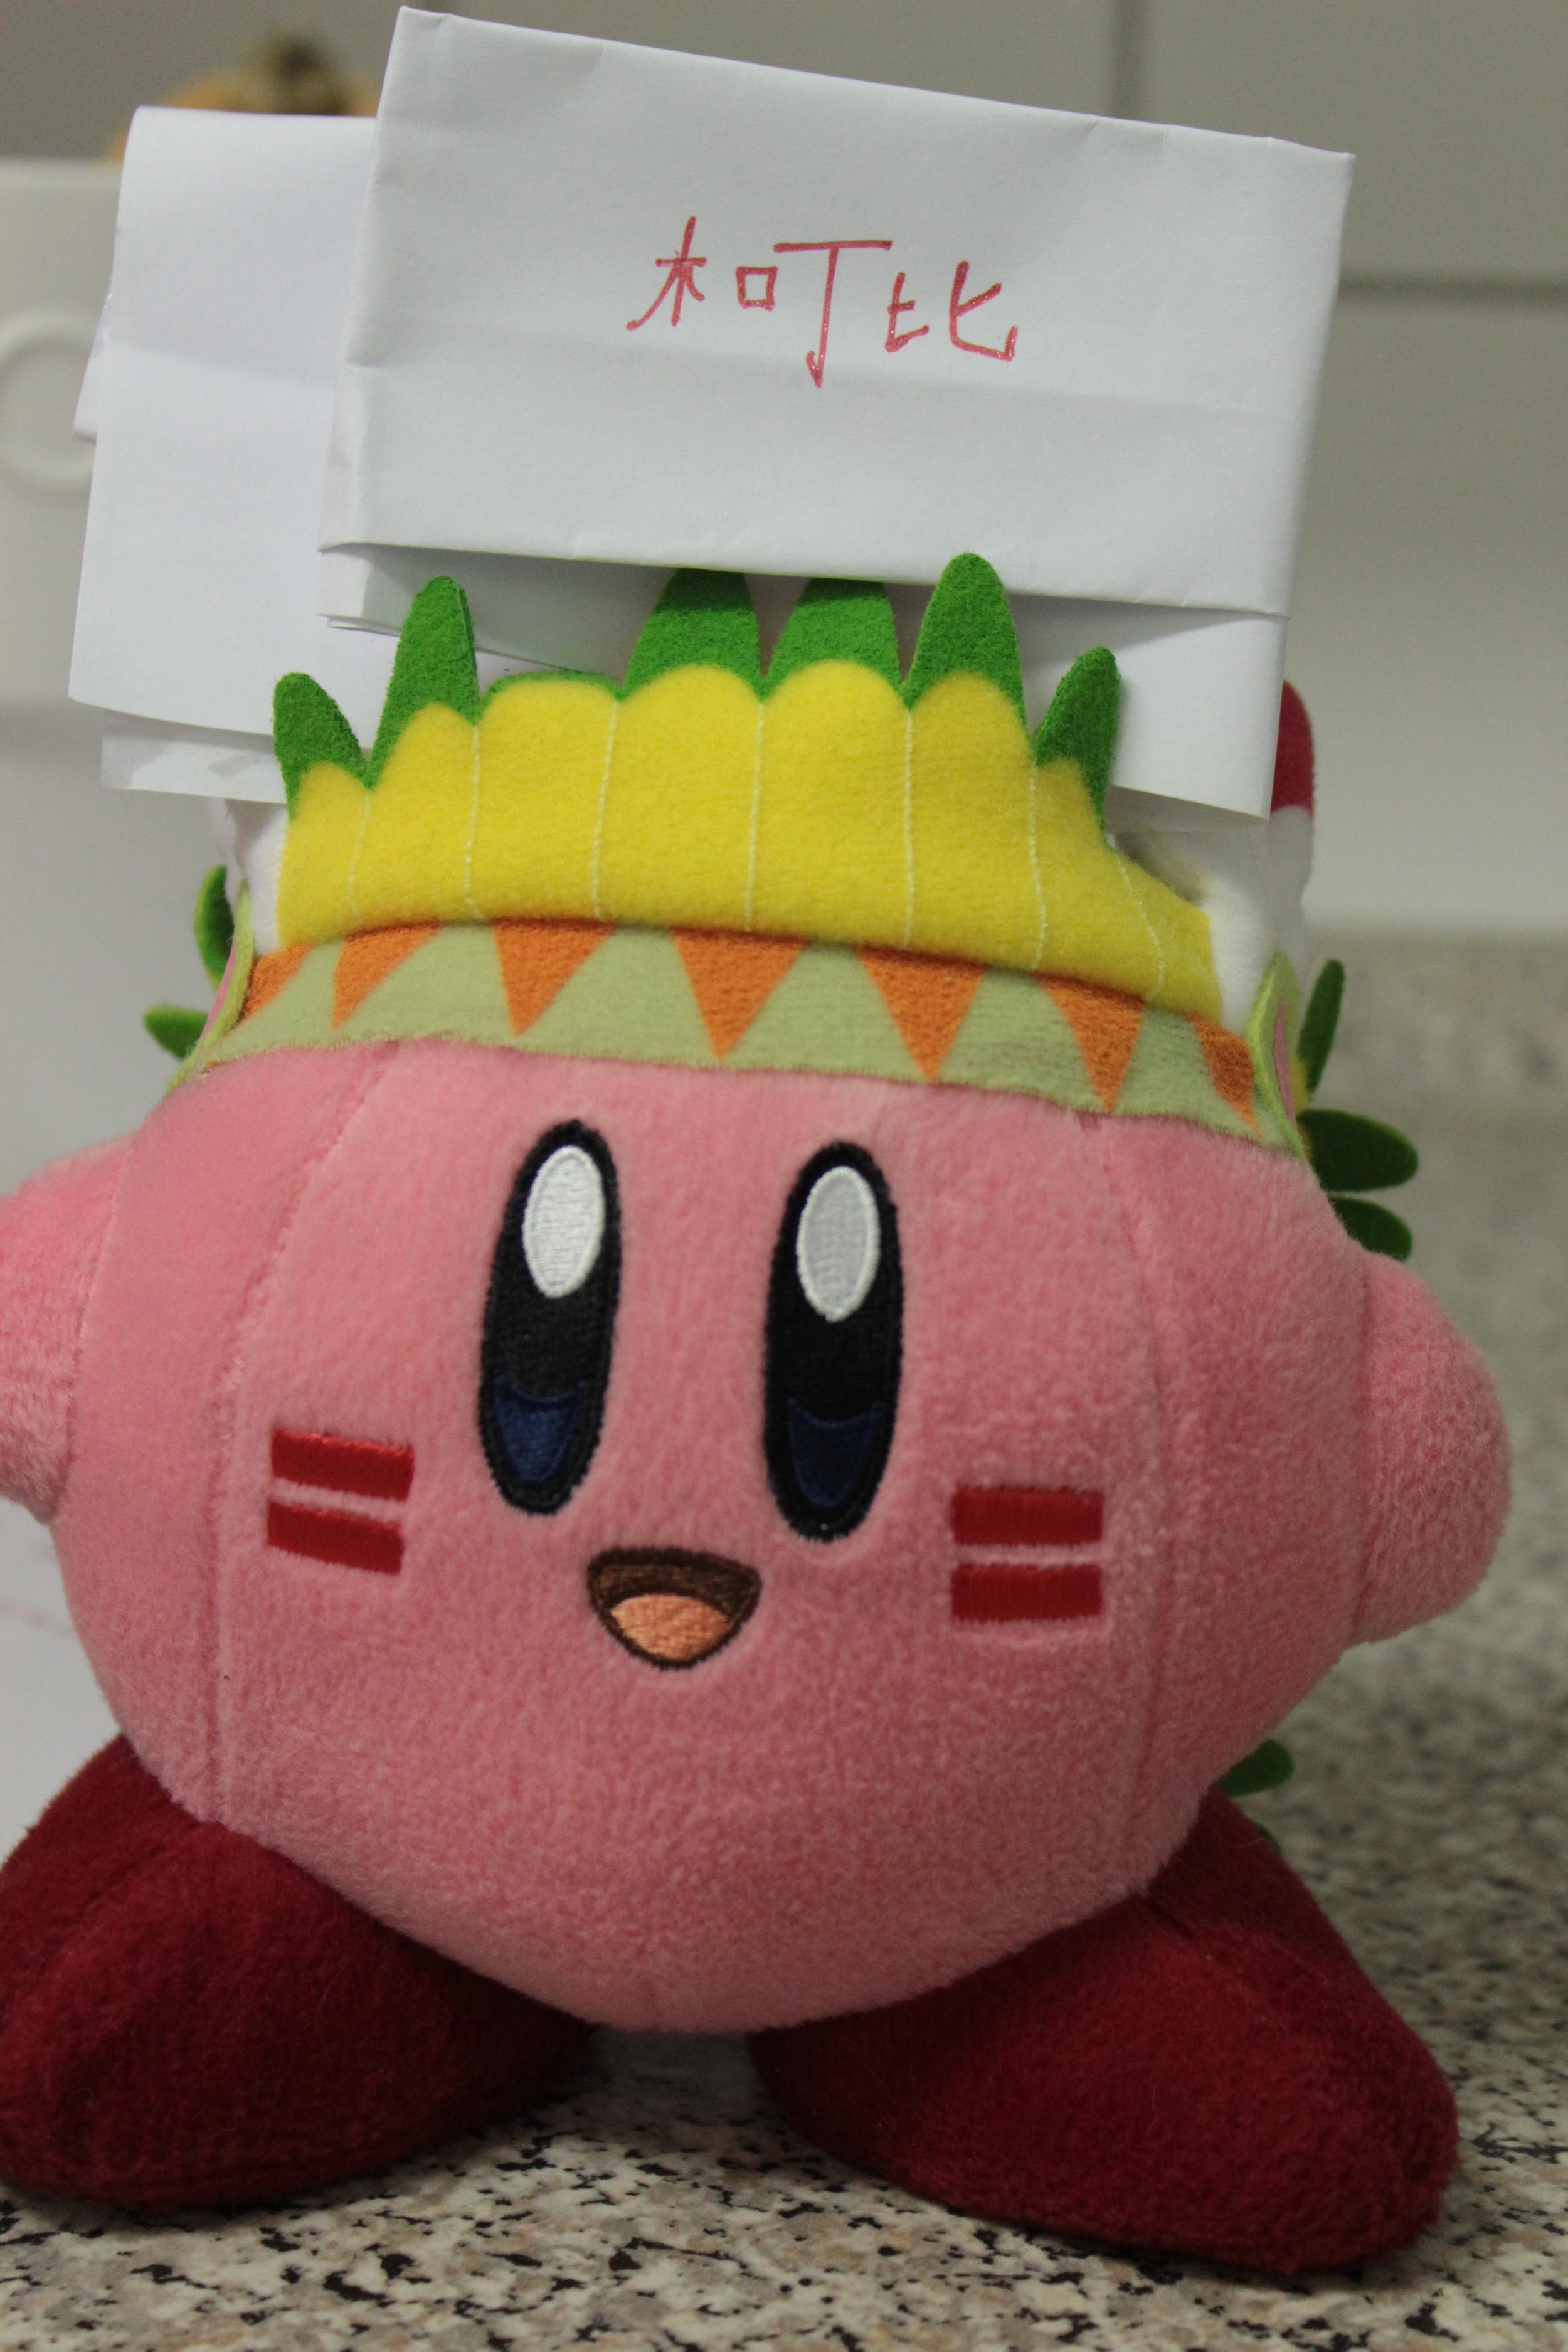 We had to do Kirby's too.